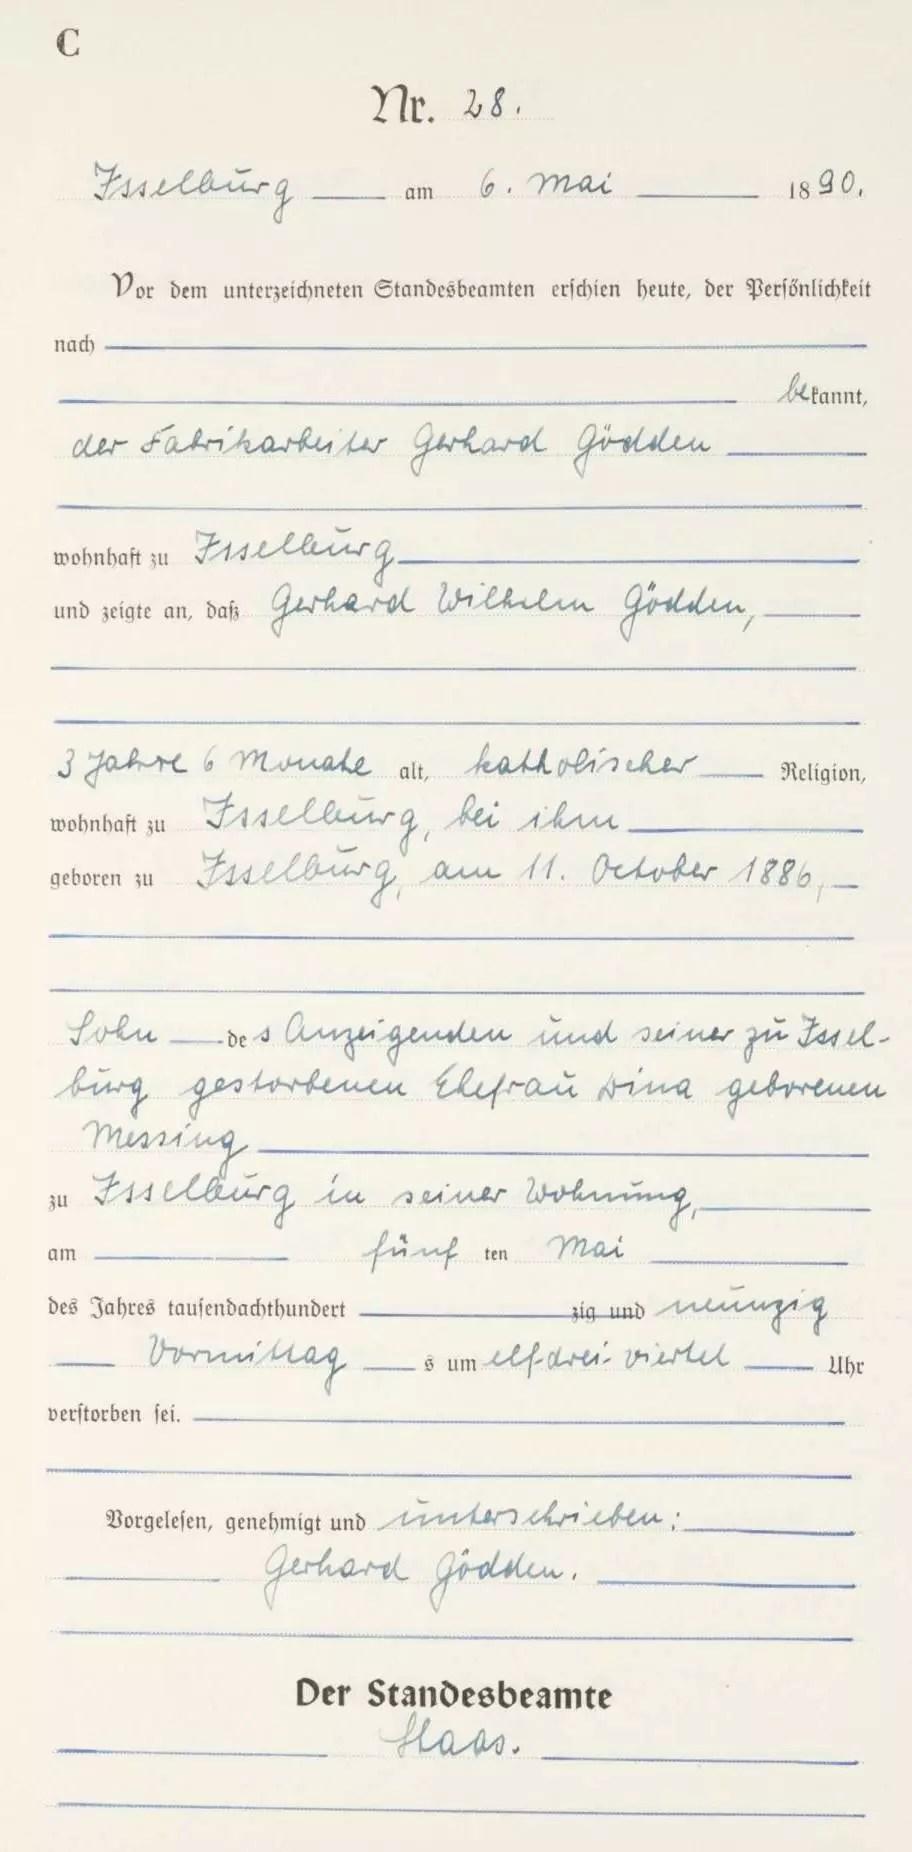 Death Record of Gerhard Wilhelm Gödden [Credit: MyHeritage Germany, North Rhine Westphalia, Death Index 1870–1940]